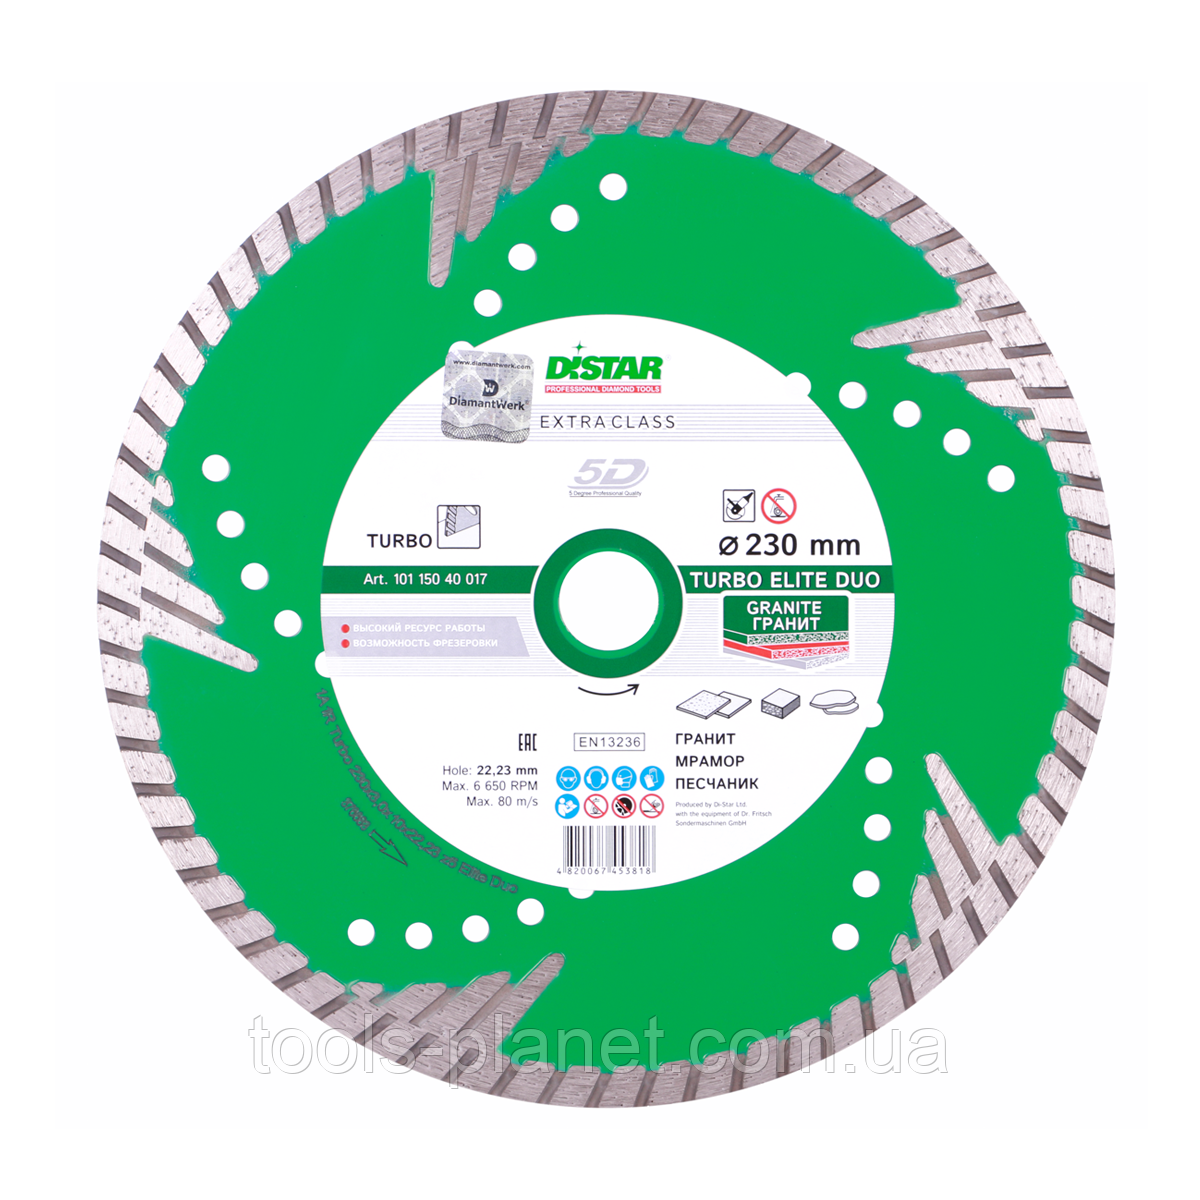 Алмазный диск Distar 1A1R Turbo 125 x 2,4 x 10 x 22,23 z4 Elite Duo 5D (10115040010)